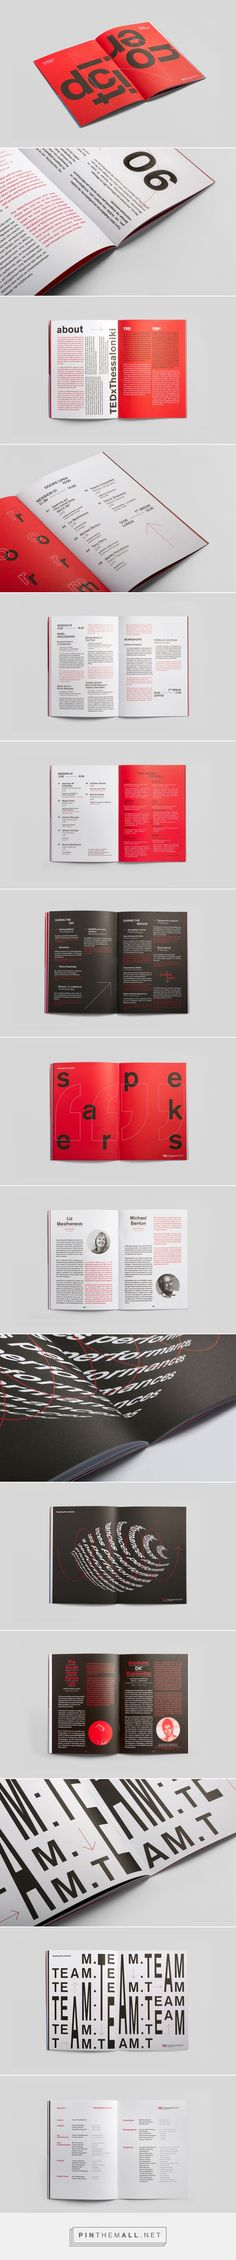 TEDx Thessaloniki 2017 by Filimonas Triantafyllou Editorial Design Magazine, Editorial Layout, Magazine Design, Page Layout Design, Book Layout, Brochure Layout, Brochure Design, Graphic Design Print, Graphic Design Inspiration